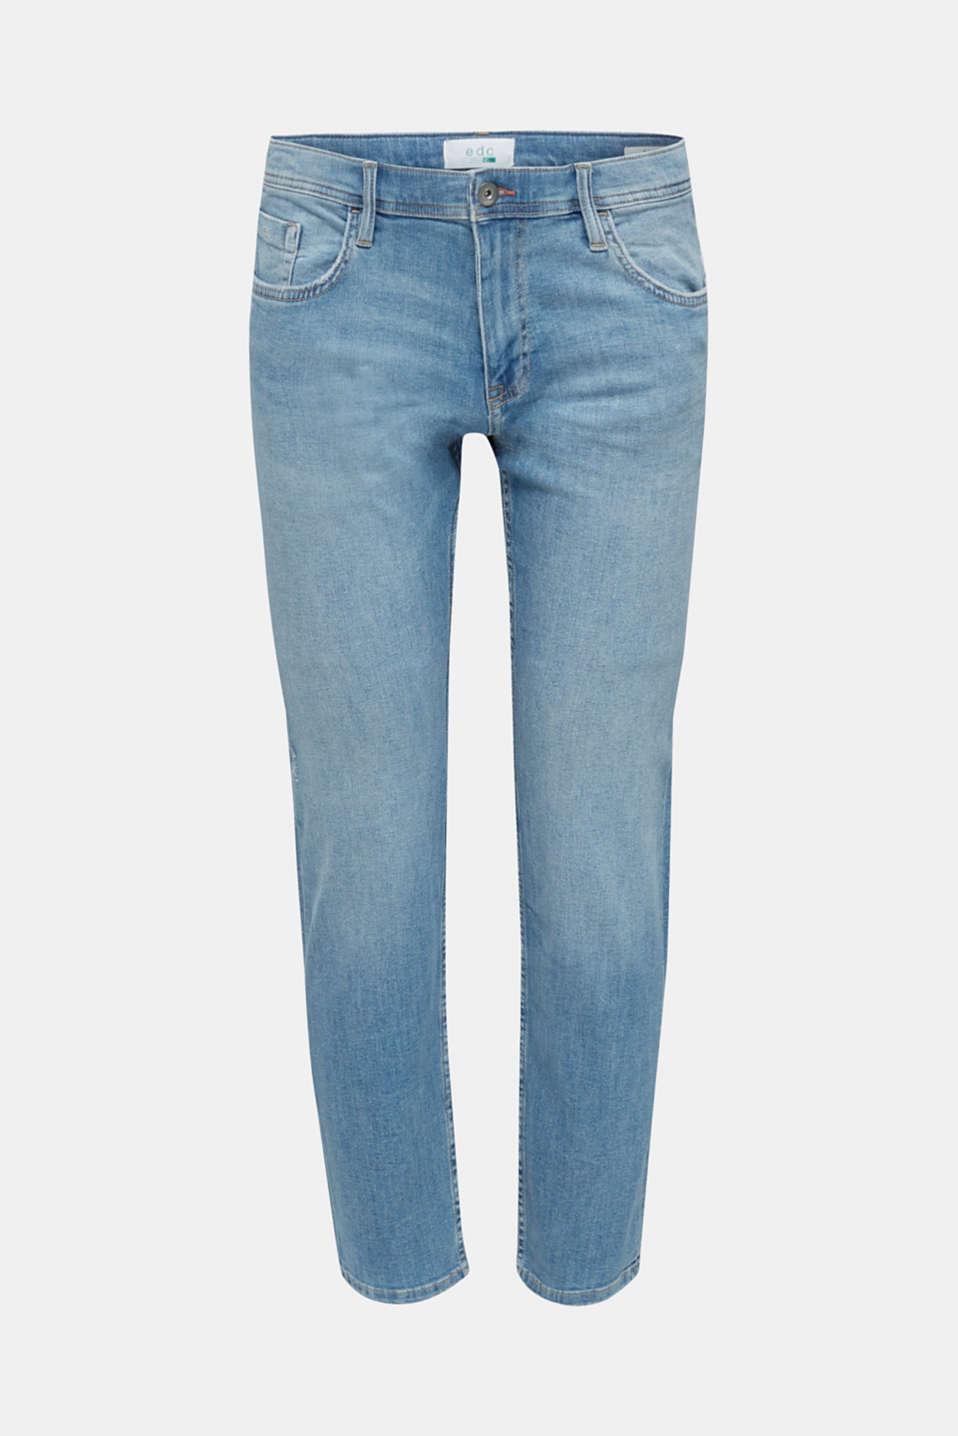 Stretch jeans in a basic design, BLUE LIGHT WASH, detail image number 6